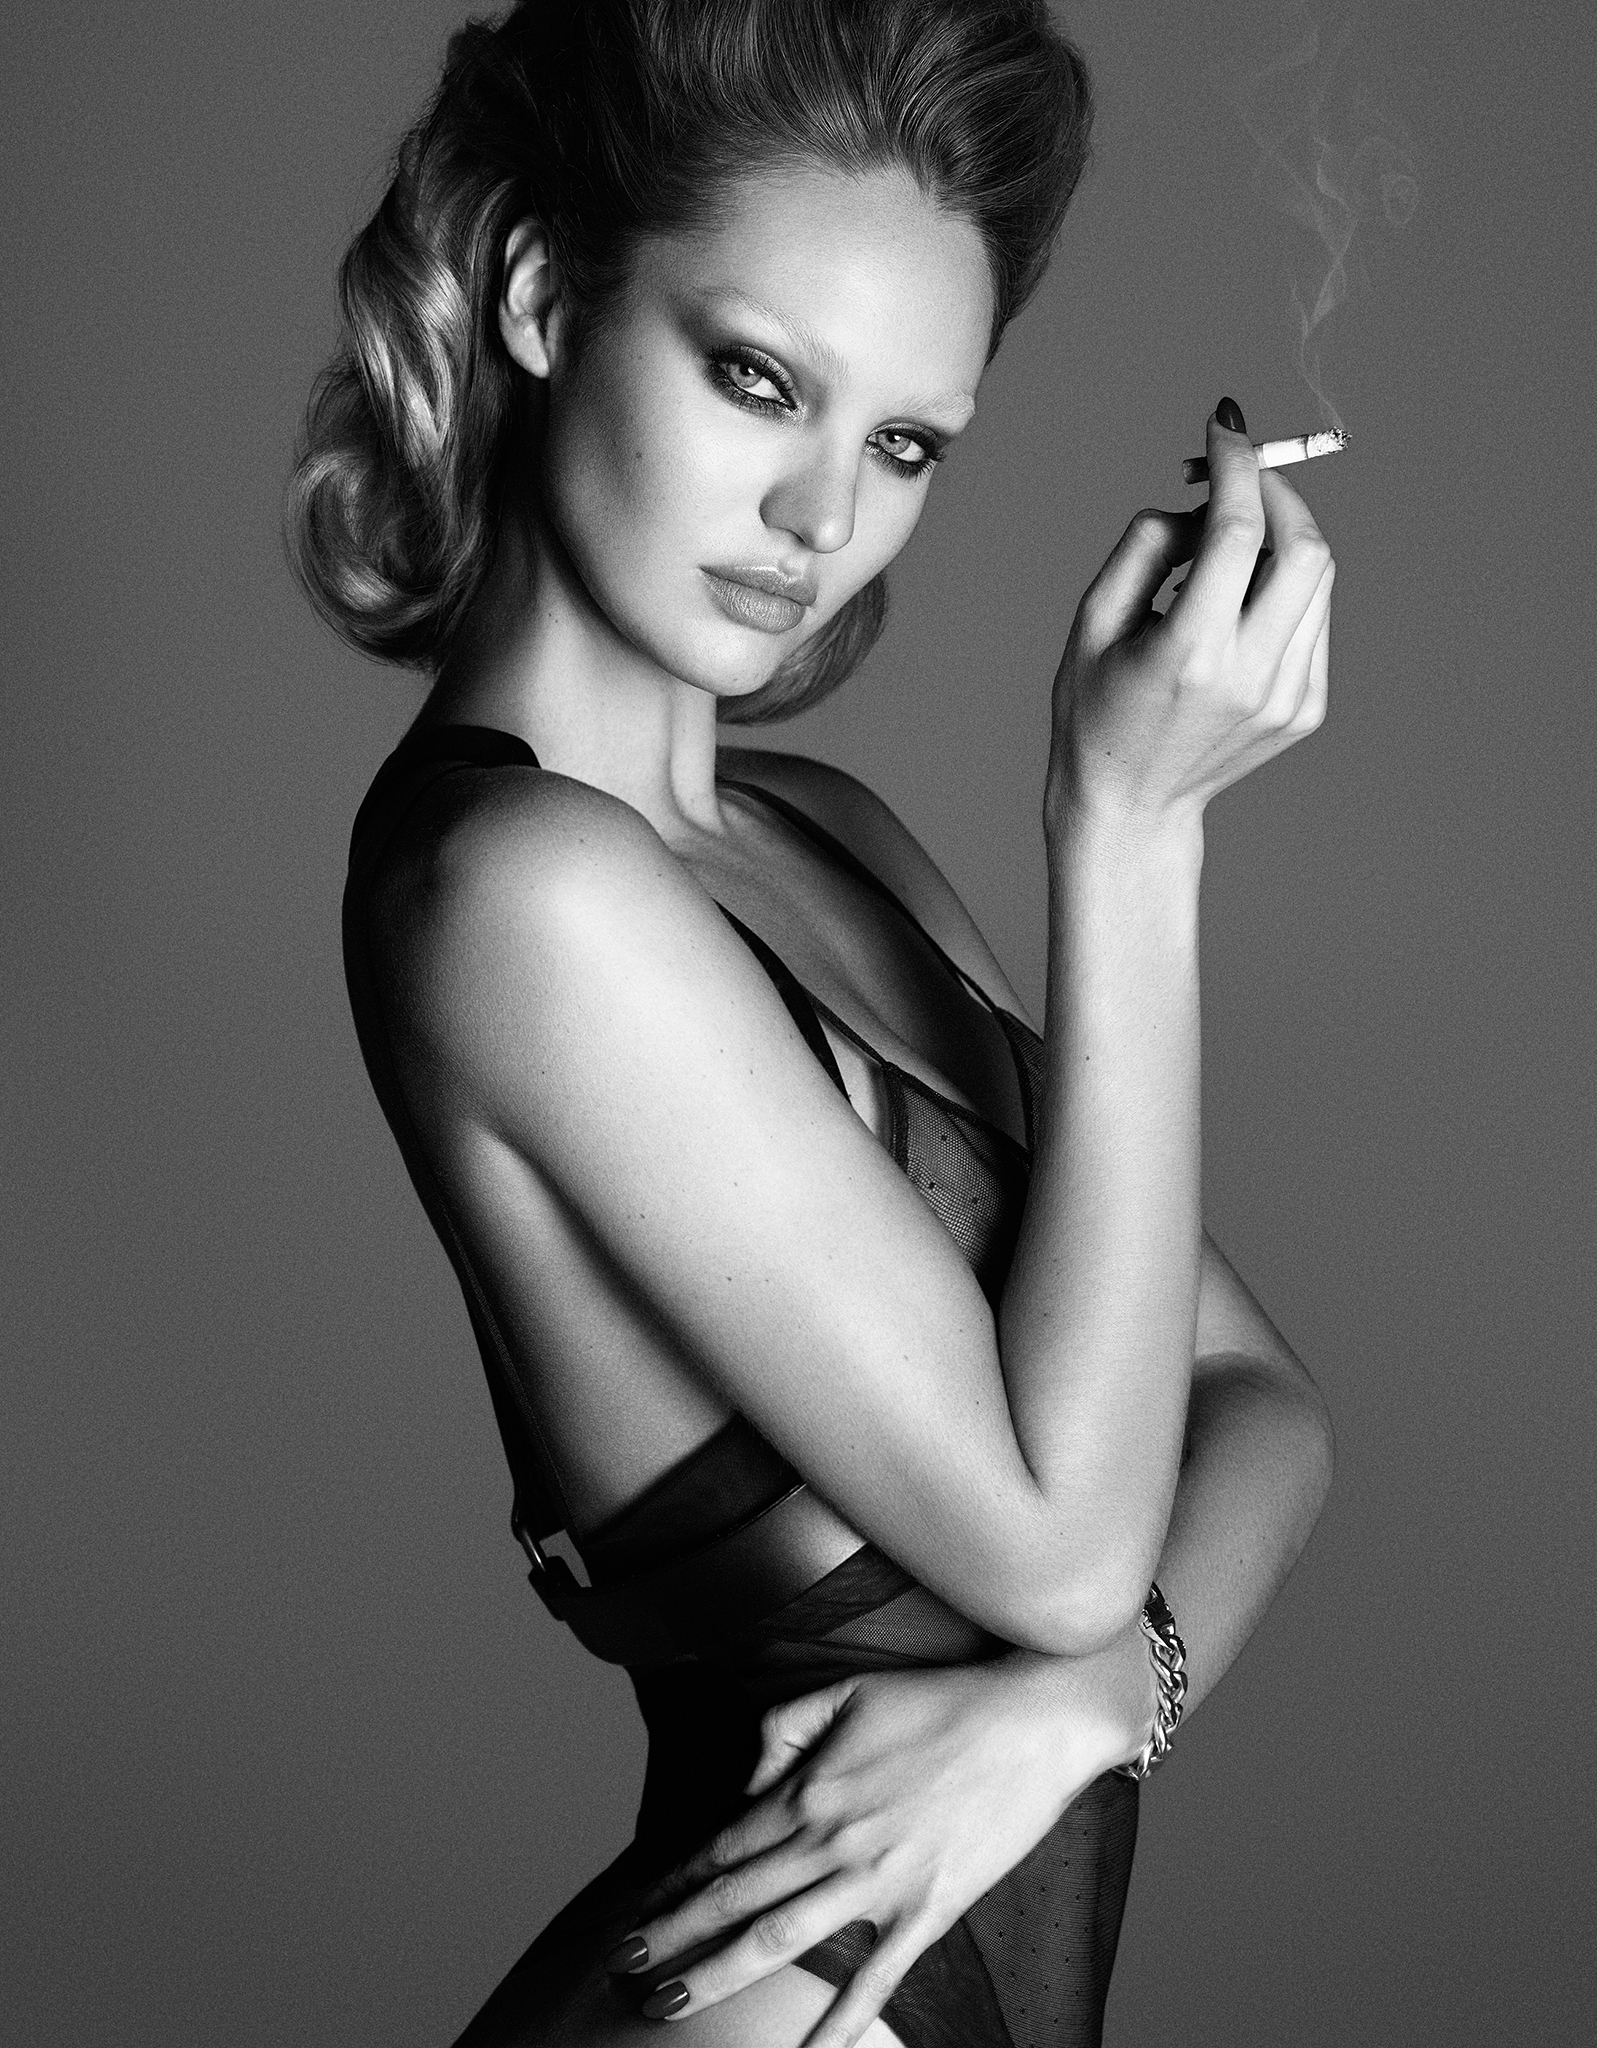 Candice Swanepoel Nude Ph...